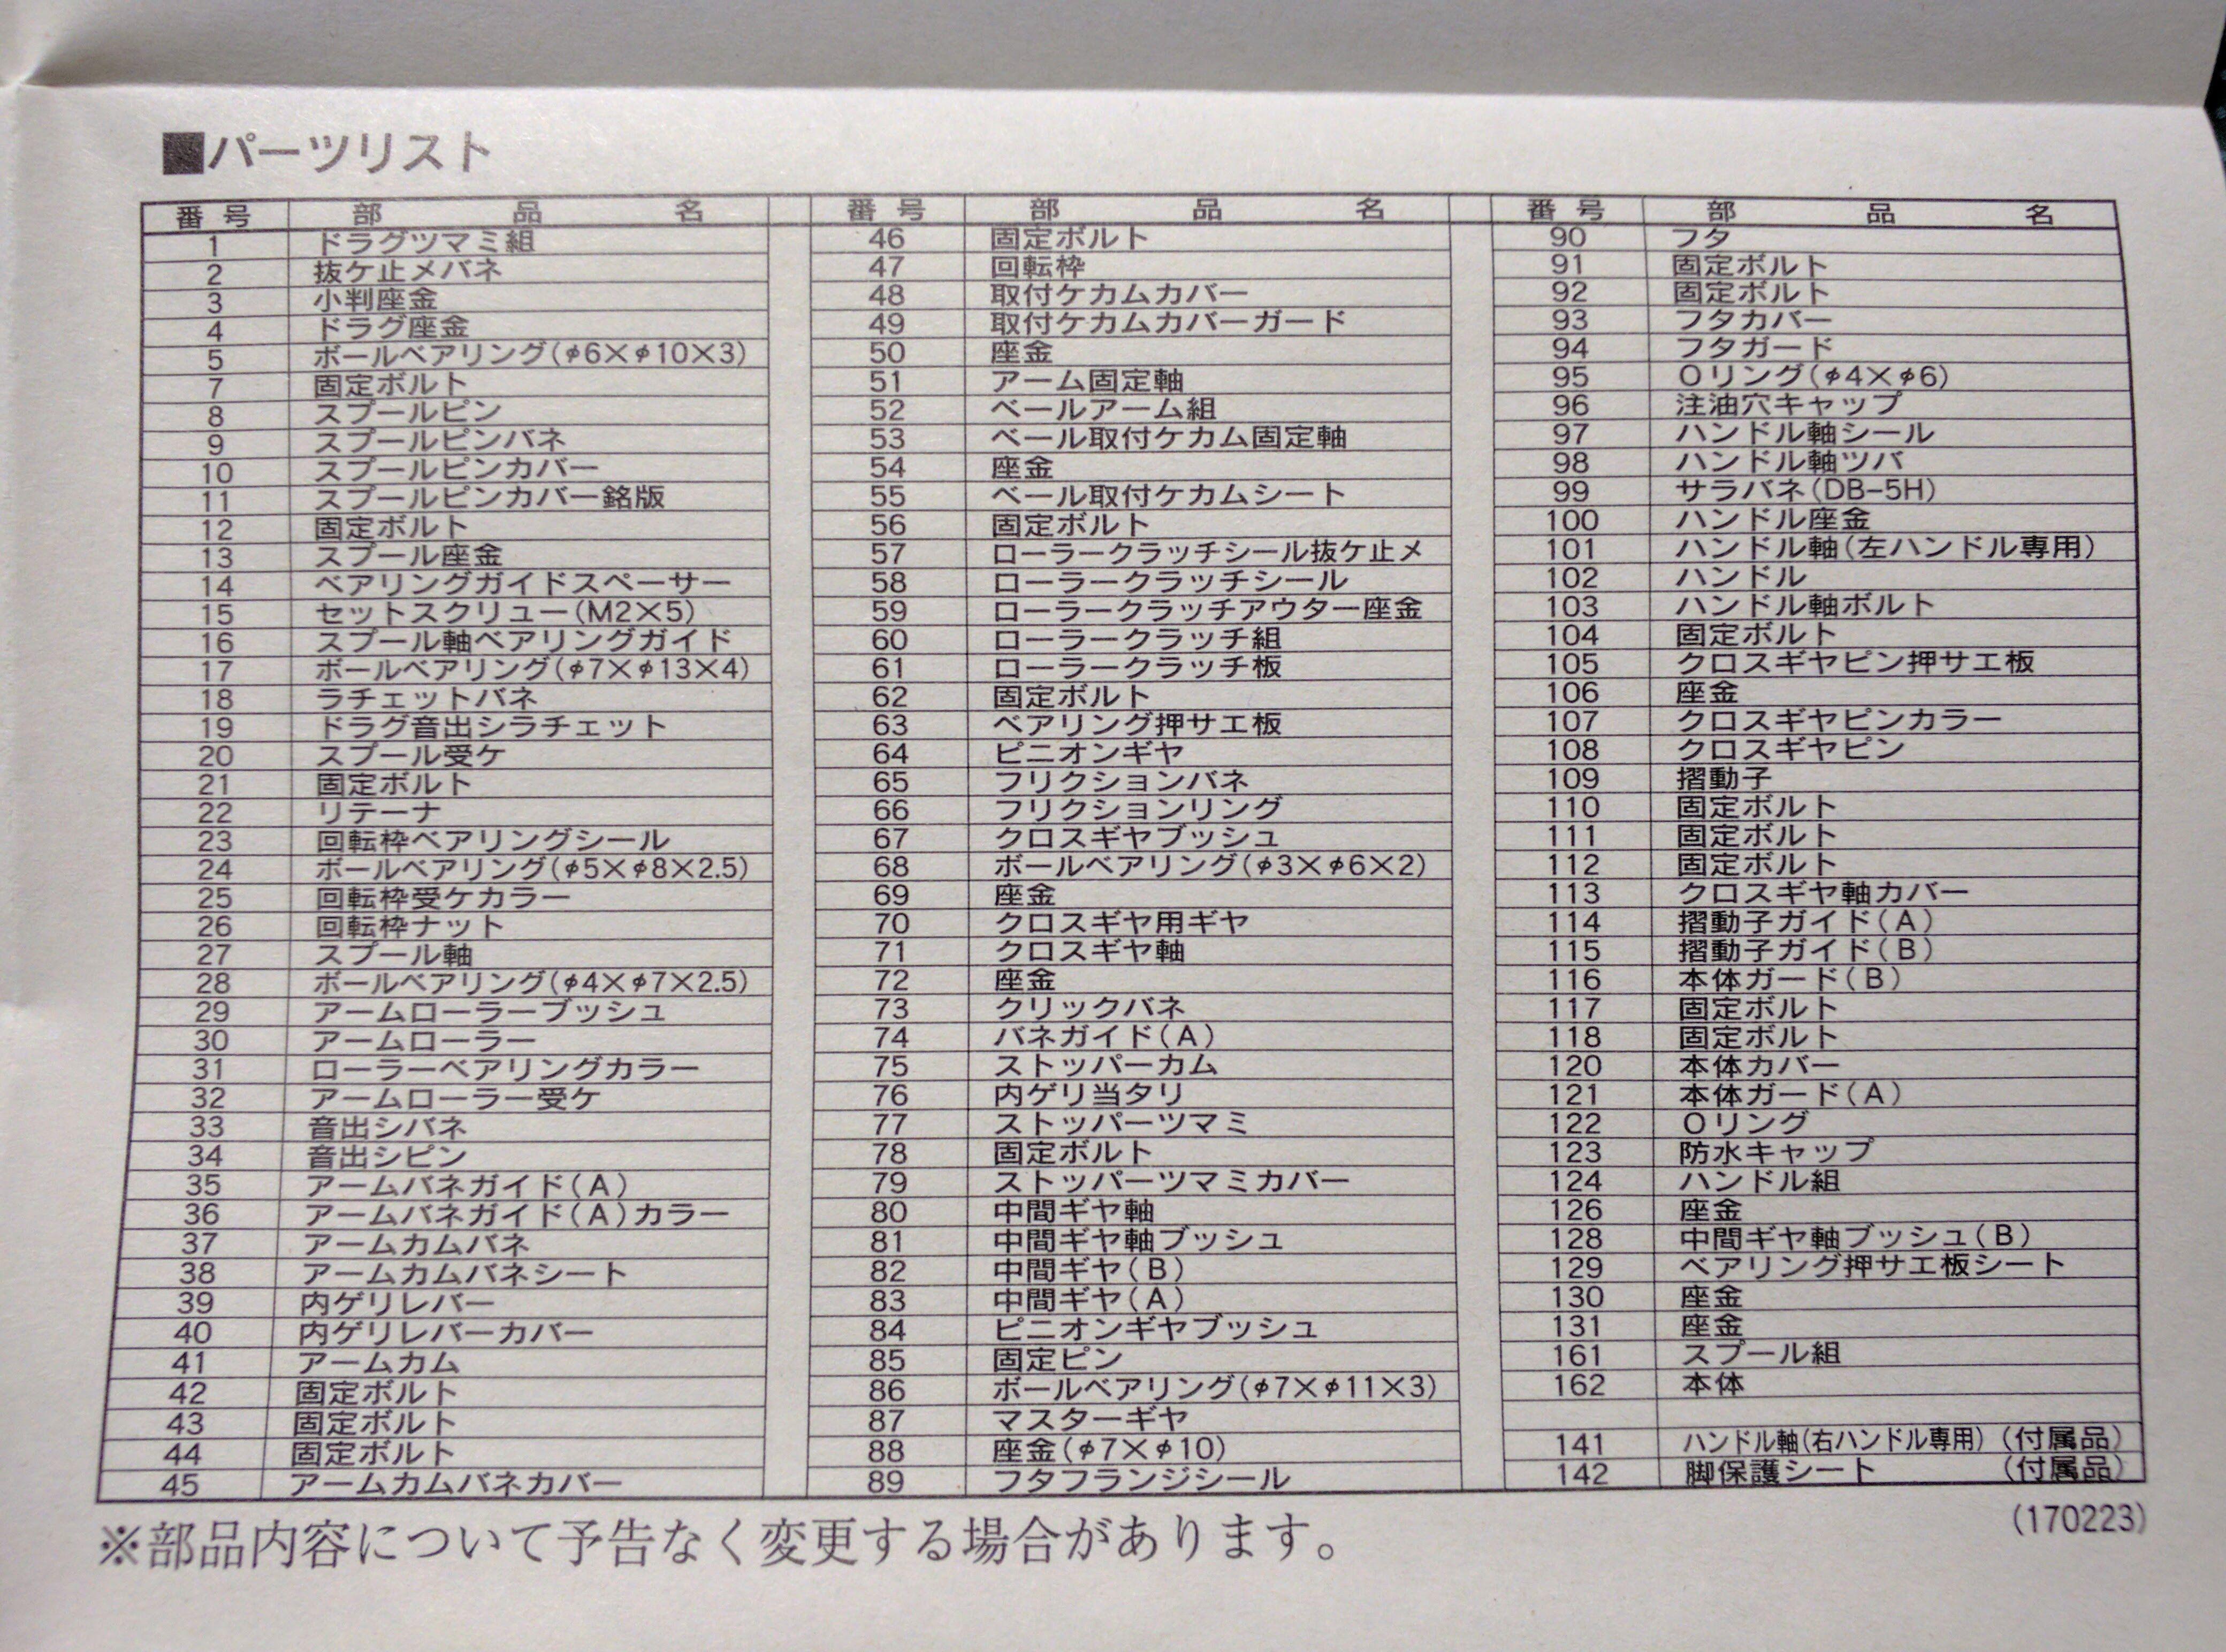 shimano-04stella-2000-parts-list (107223)